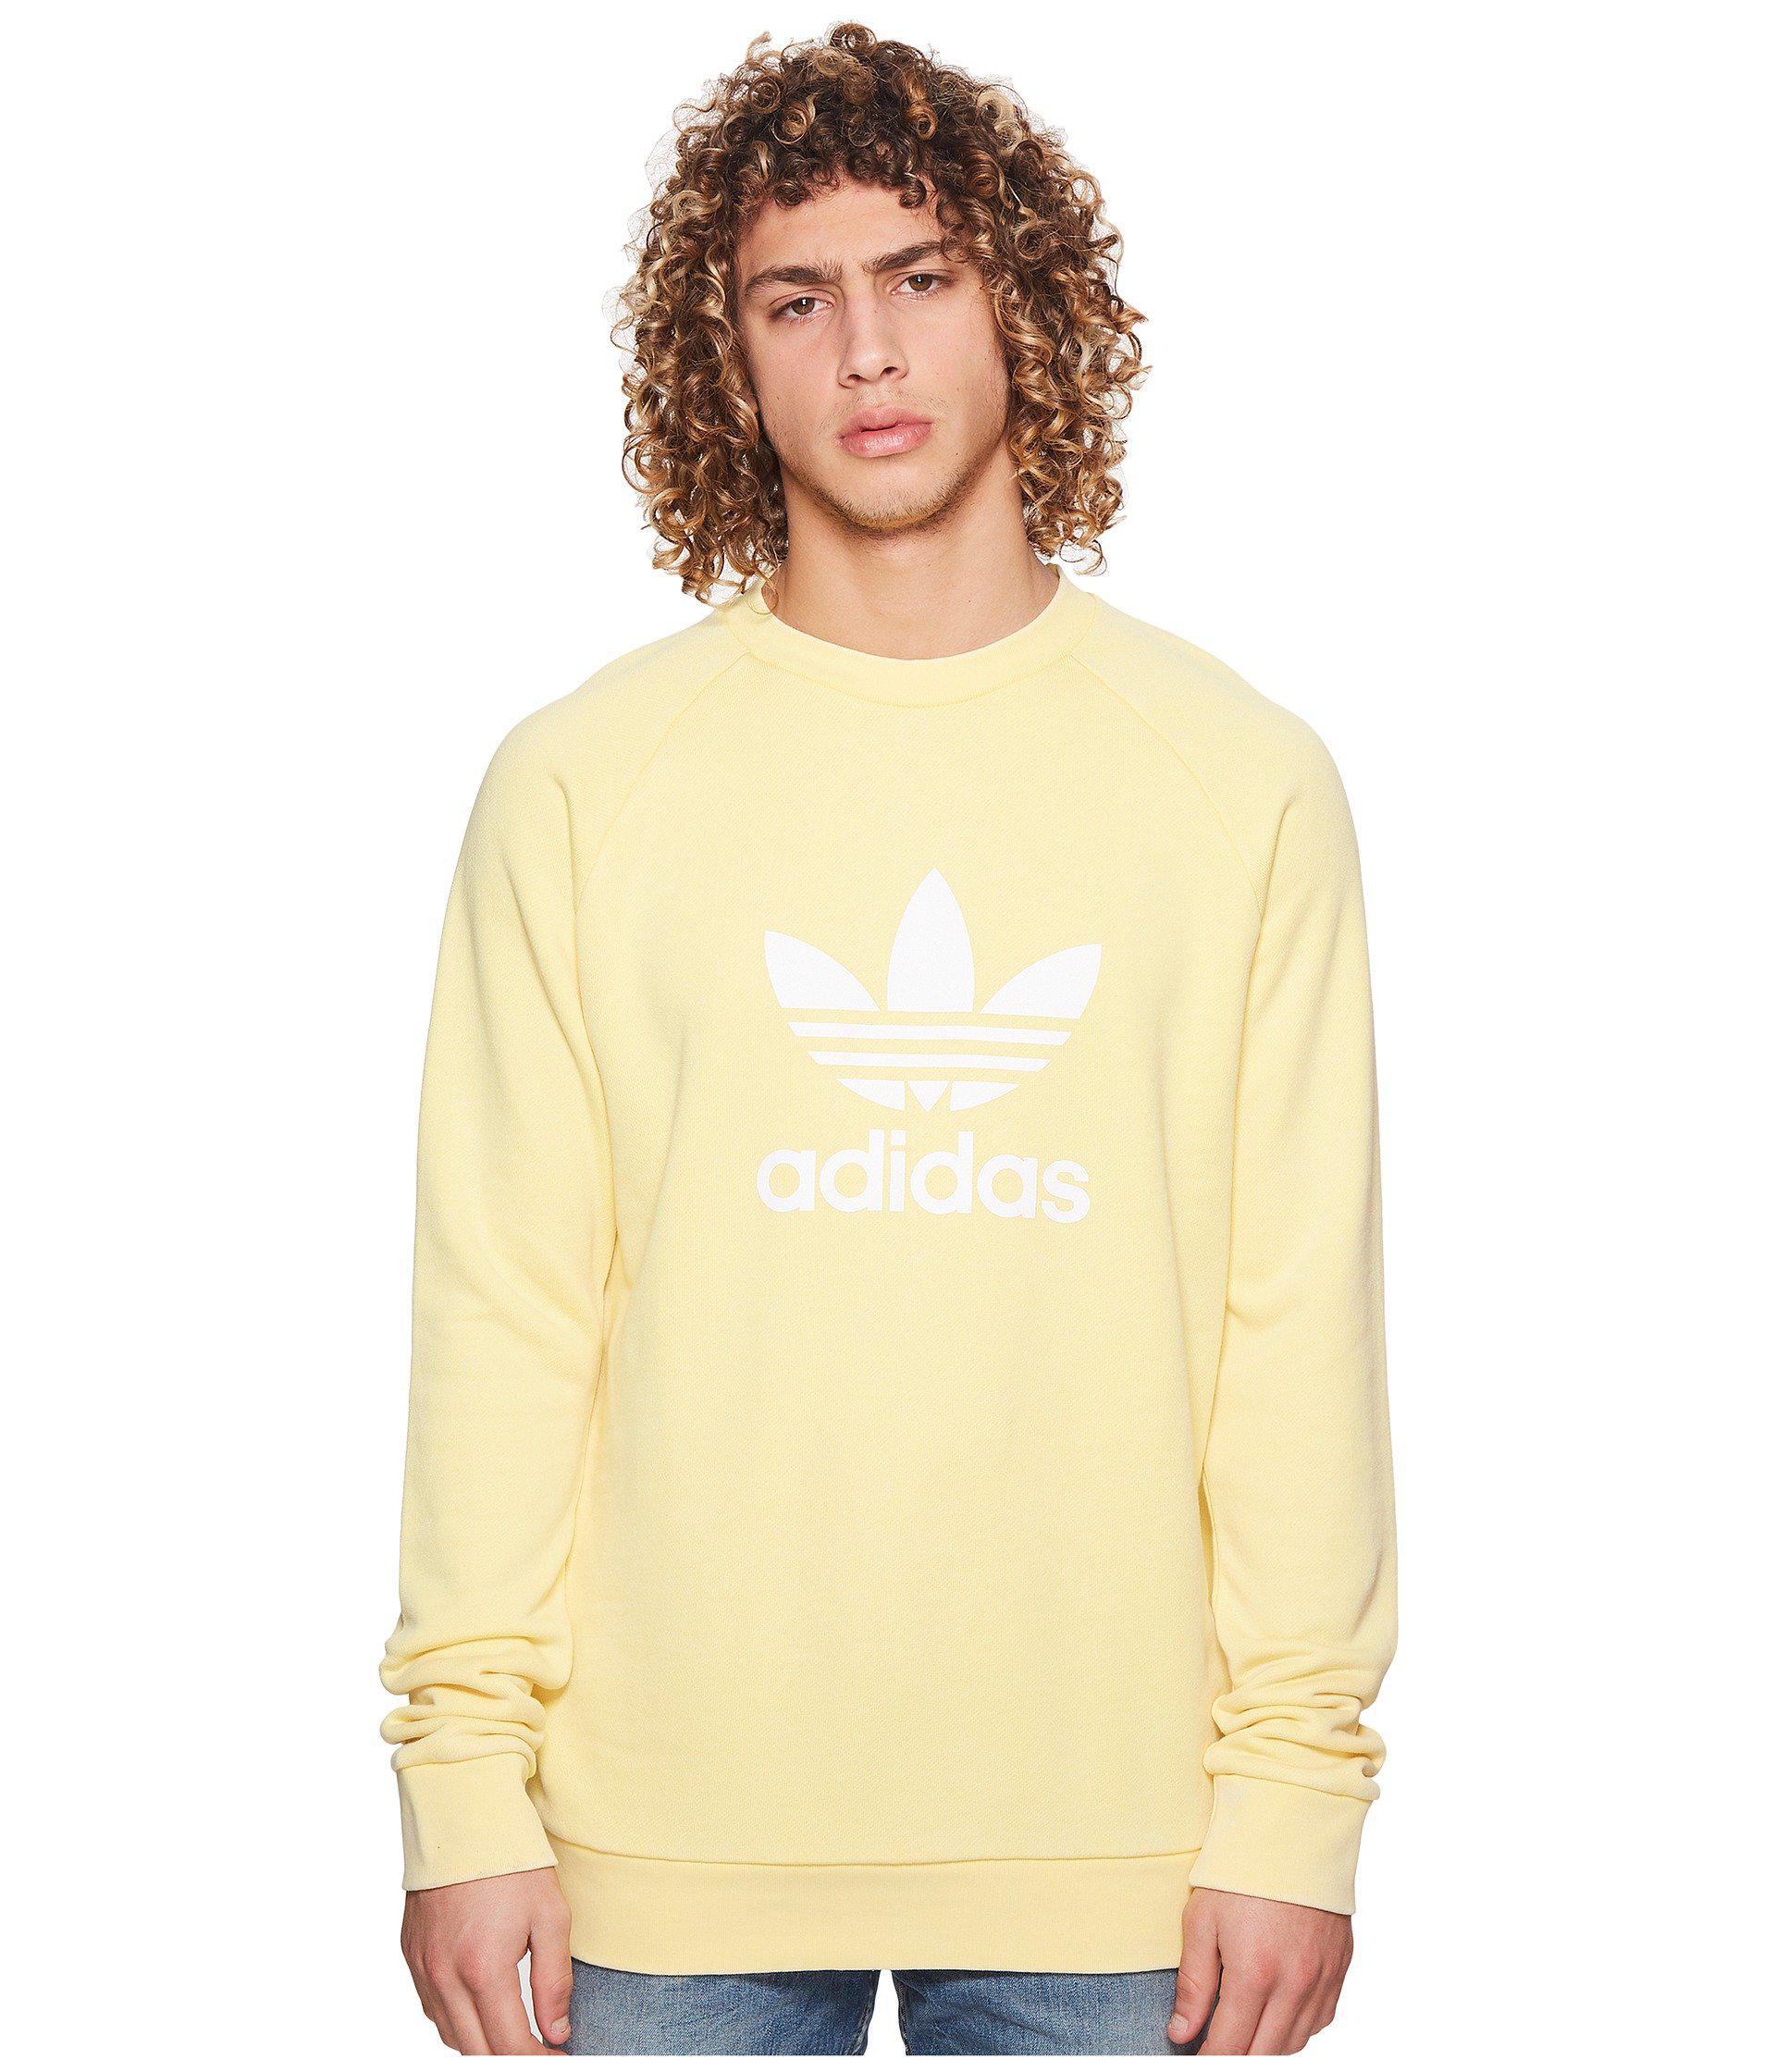 28f9d3d485b Lyst - adidas Originals Trefoil Crew Sweatshirt in Yellow for Men